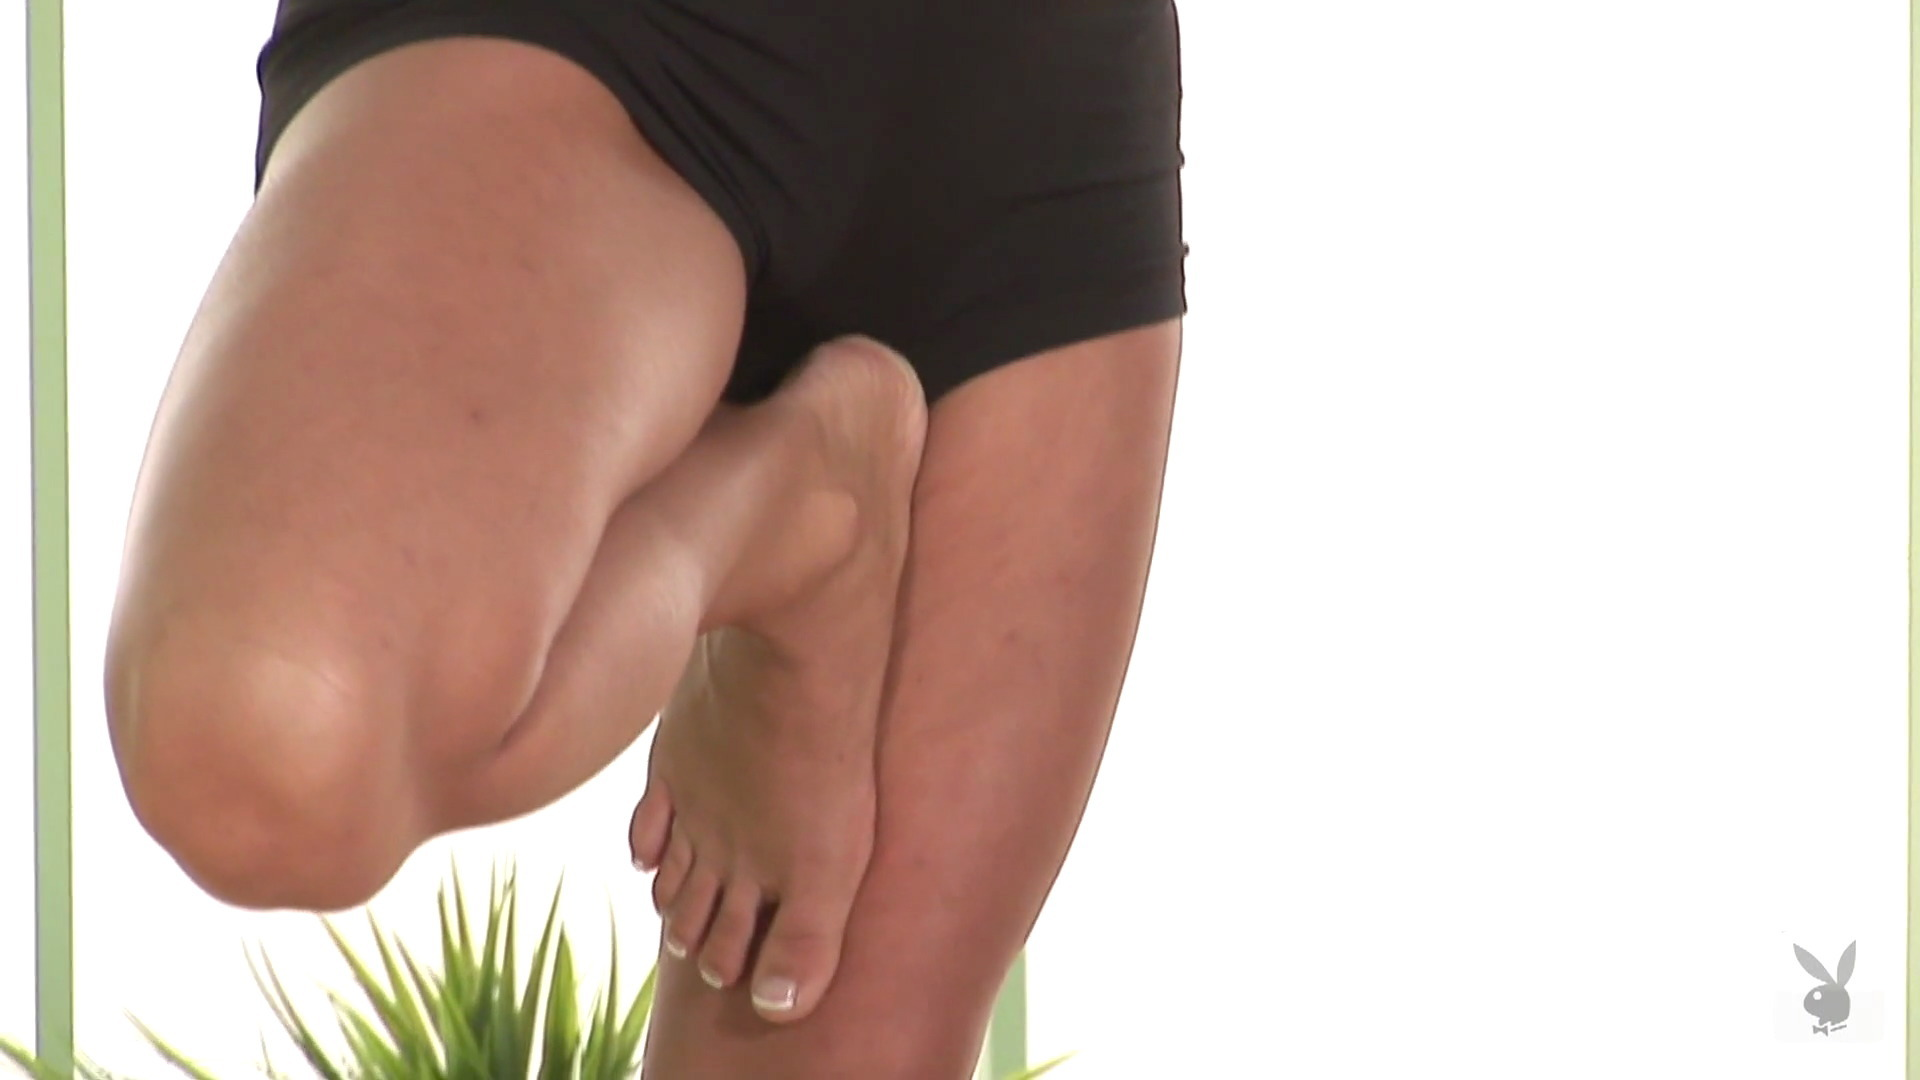 sara jean underwood bare feet